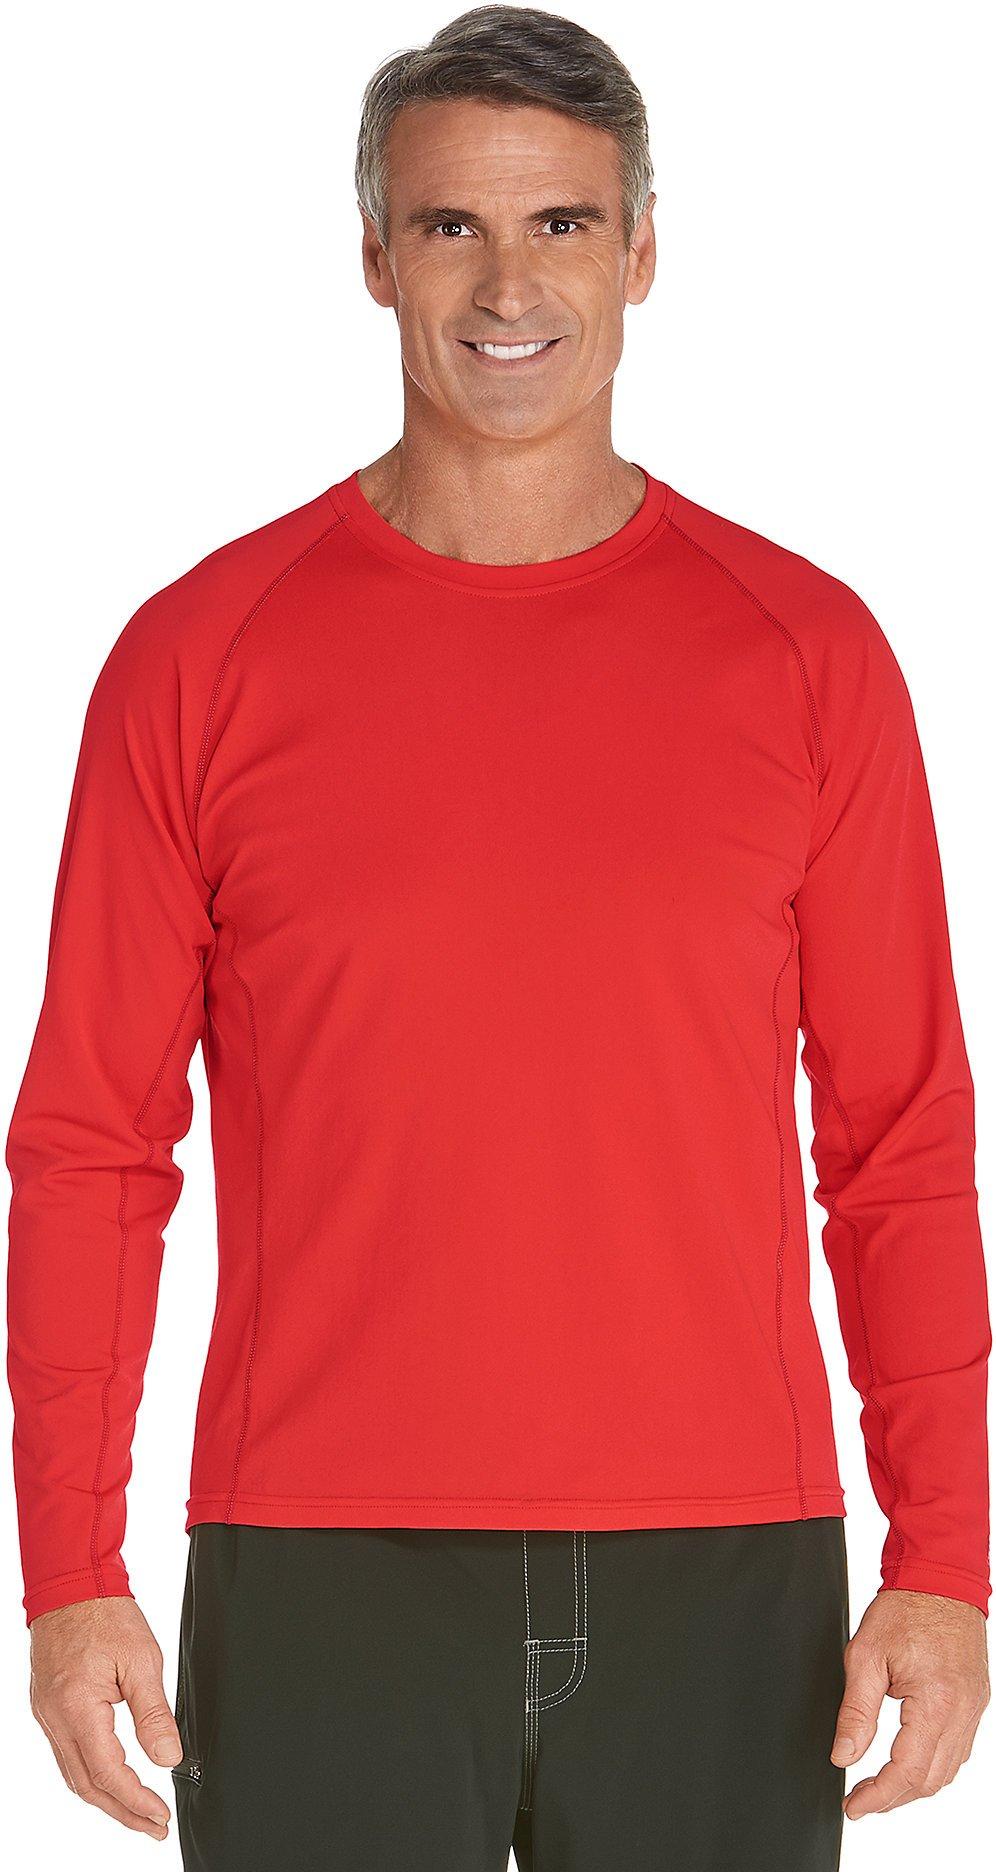 Coolibar UPF 50+ Men's Long Sleeve High Tide Swim Shirt - Sun Protective (Large- Tropical Red)